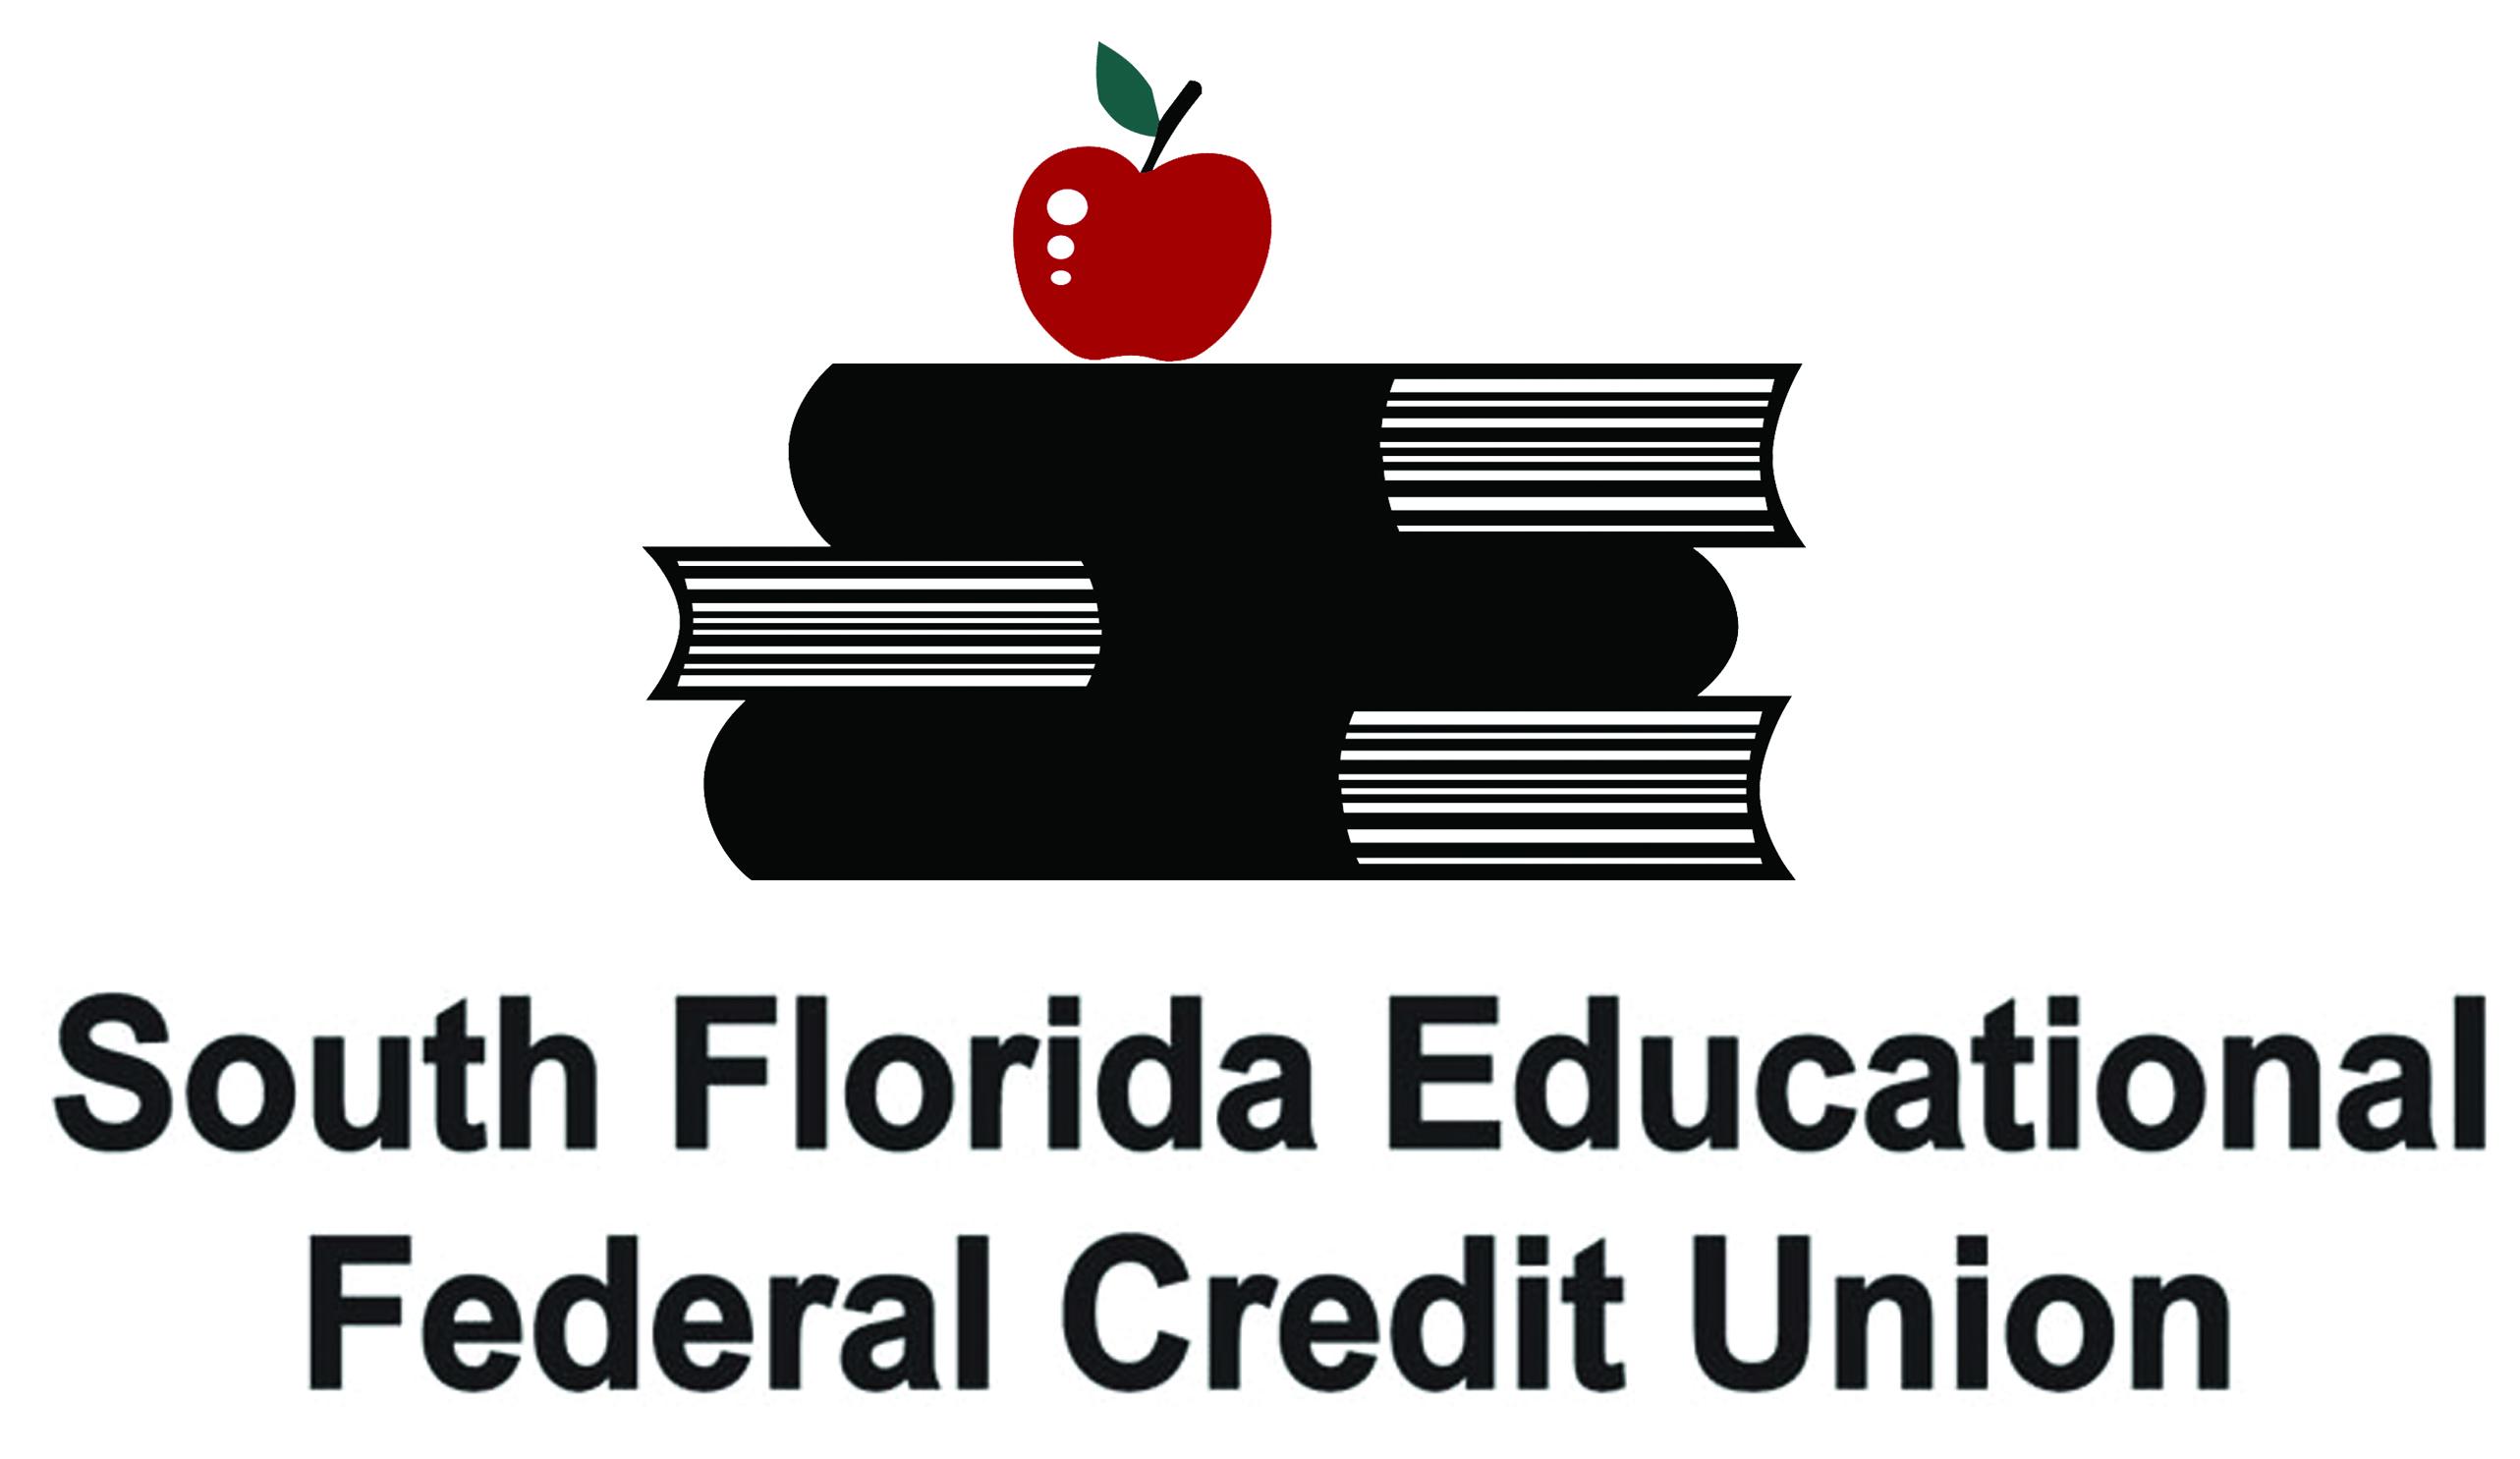 SFEFCU-Stacked-Logo_1